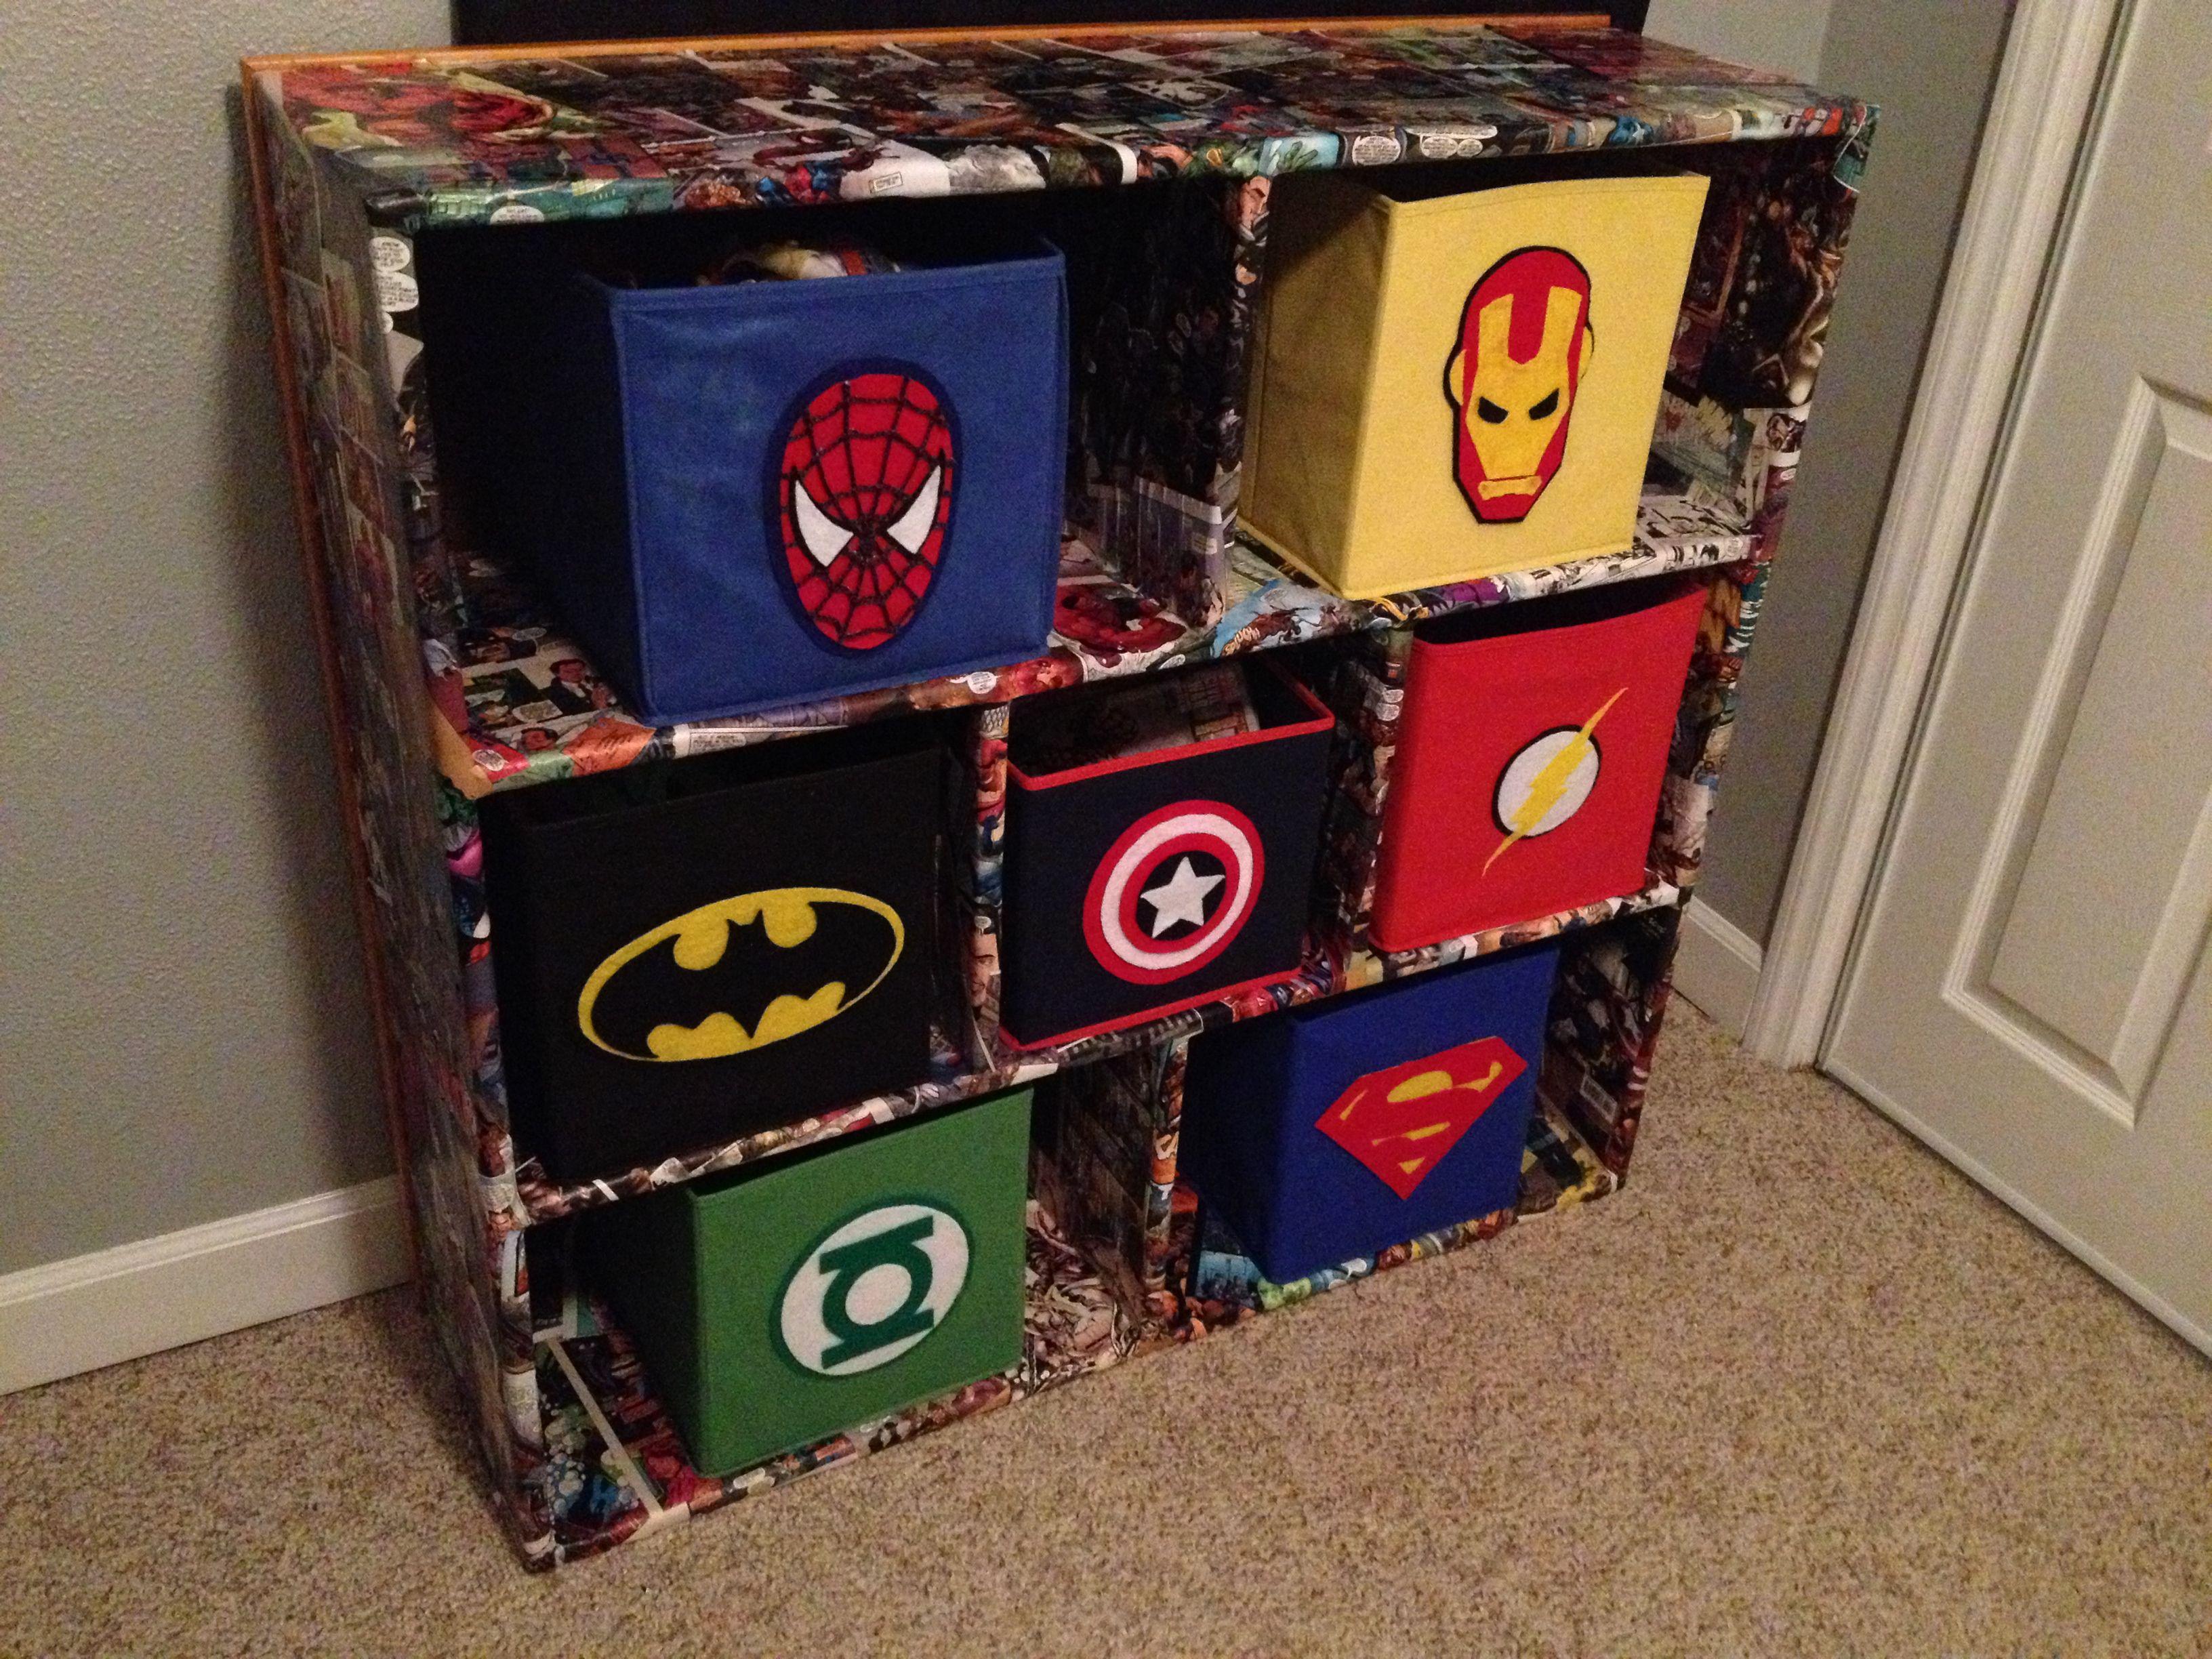 Comic bookAvengers bedroom on Pinterest  Comic Books Super Hero Bedroom and Super Heros